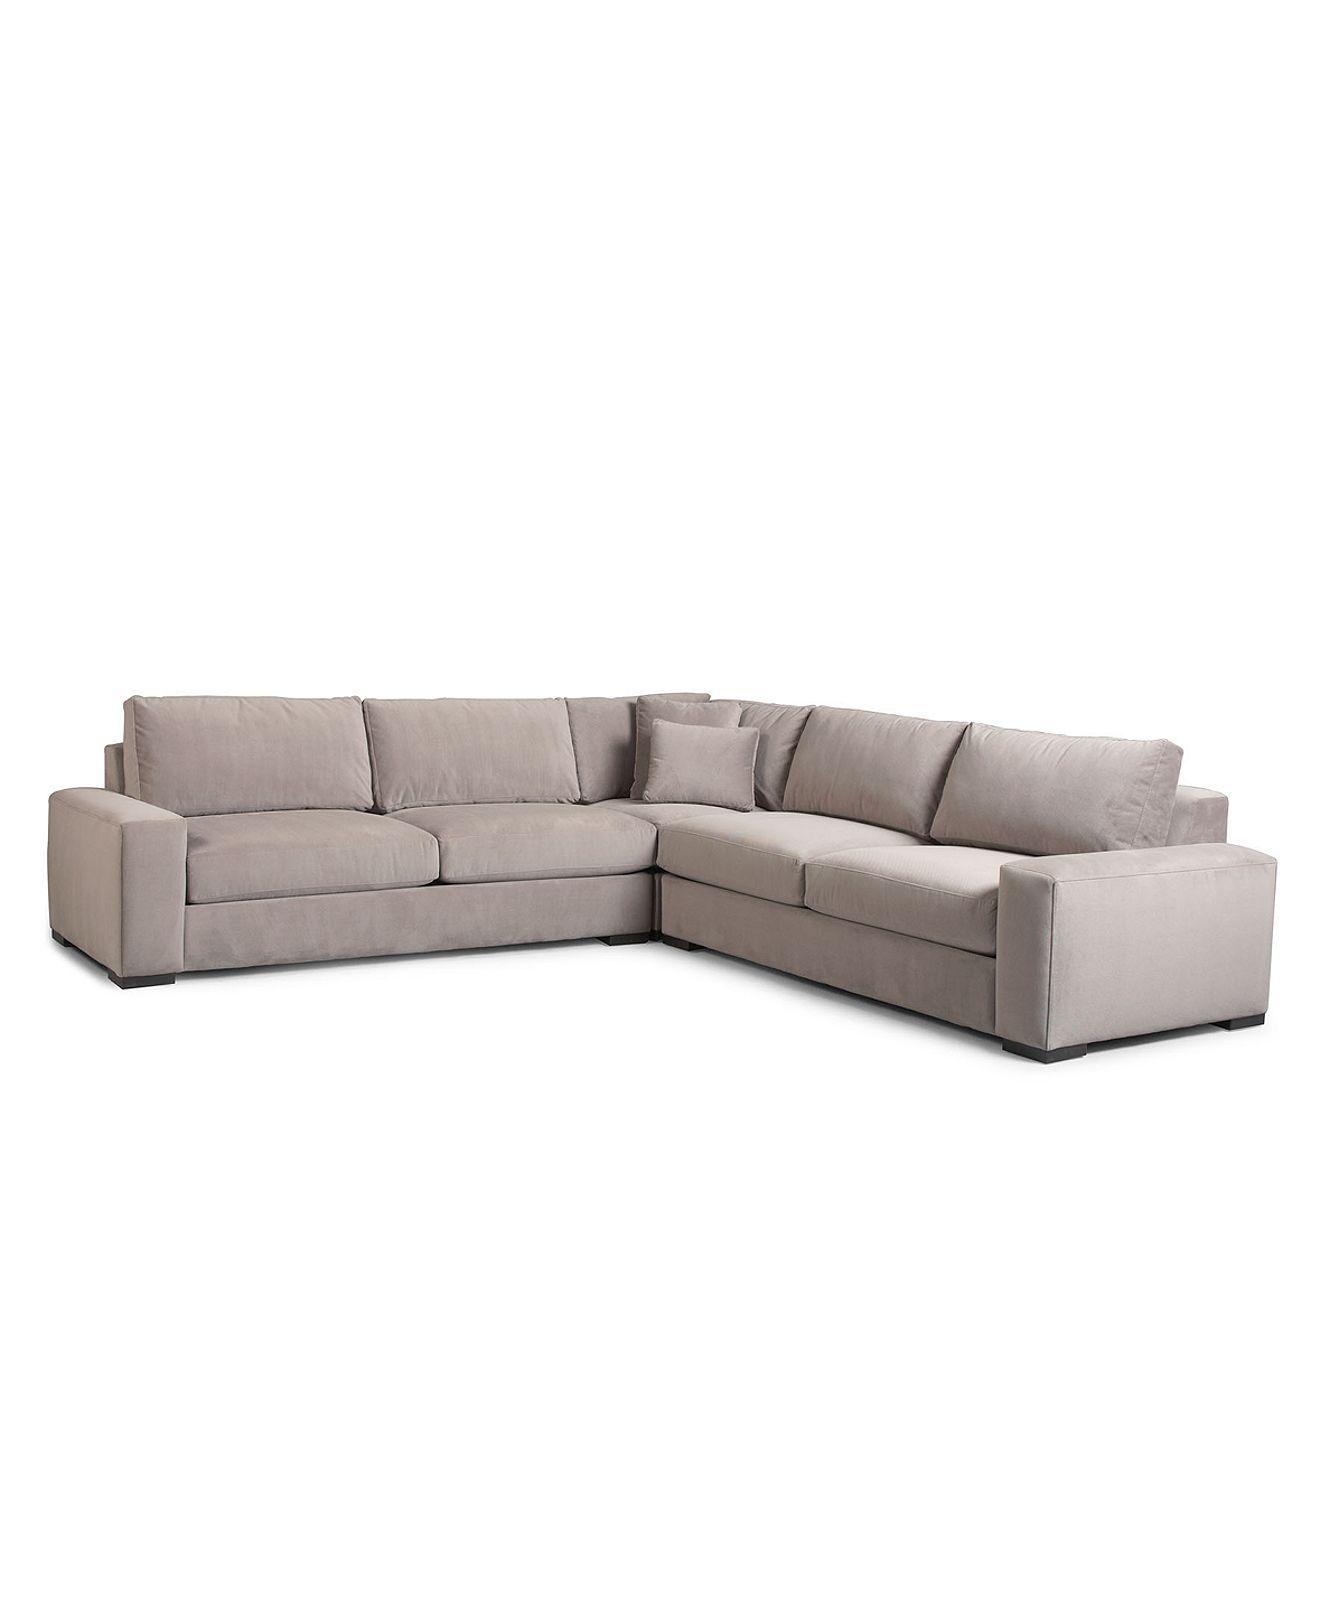 Cool Keira Sectional Sofa 3 Piece Corner Unit Left Arm Facing Machost Co Dining Chair Design Ideas Machostcouk